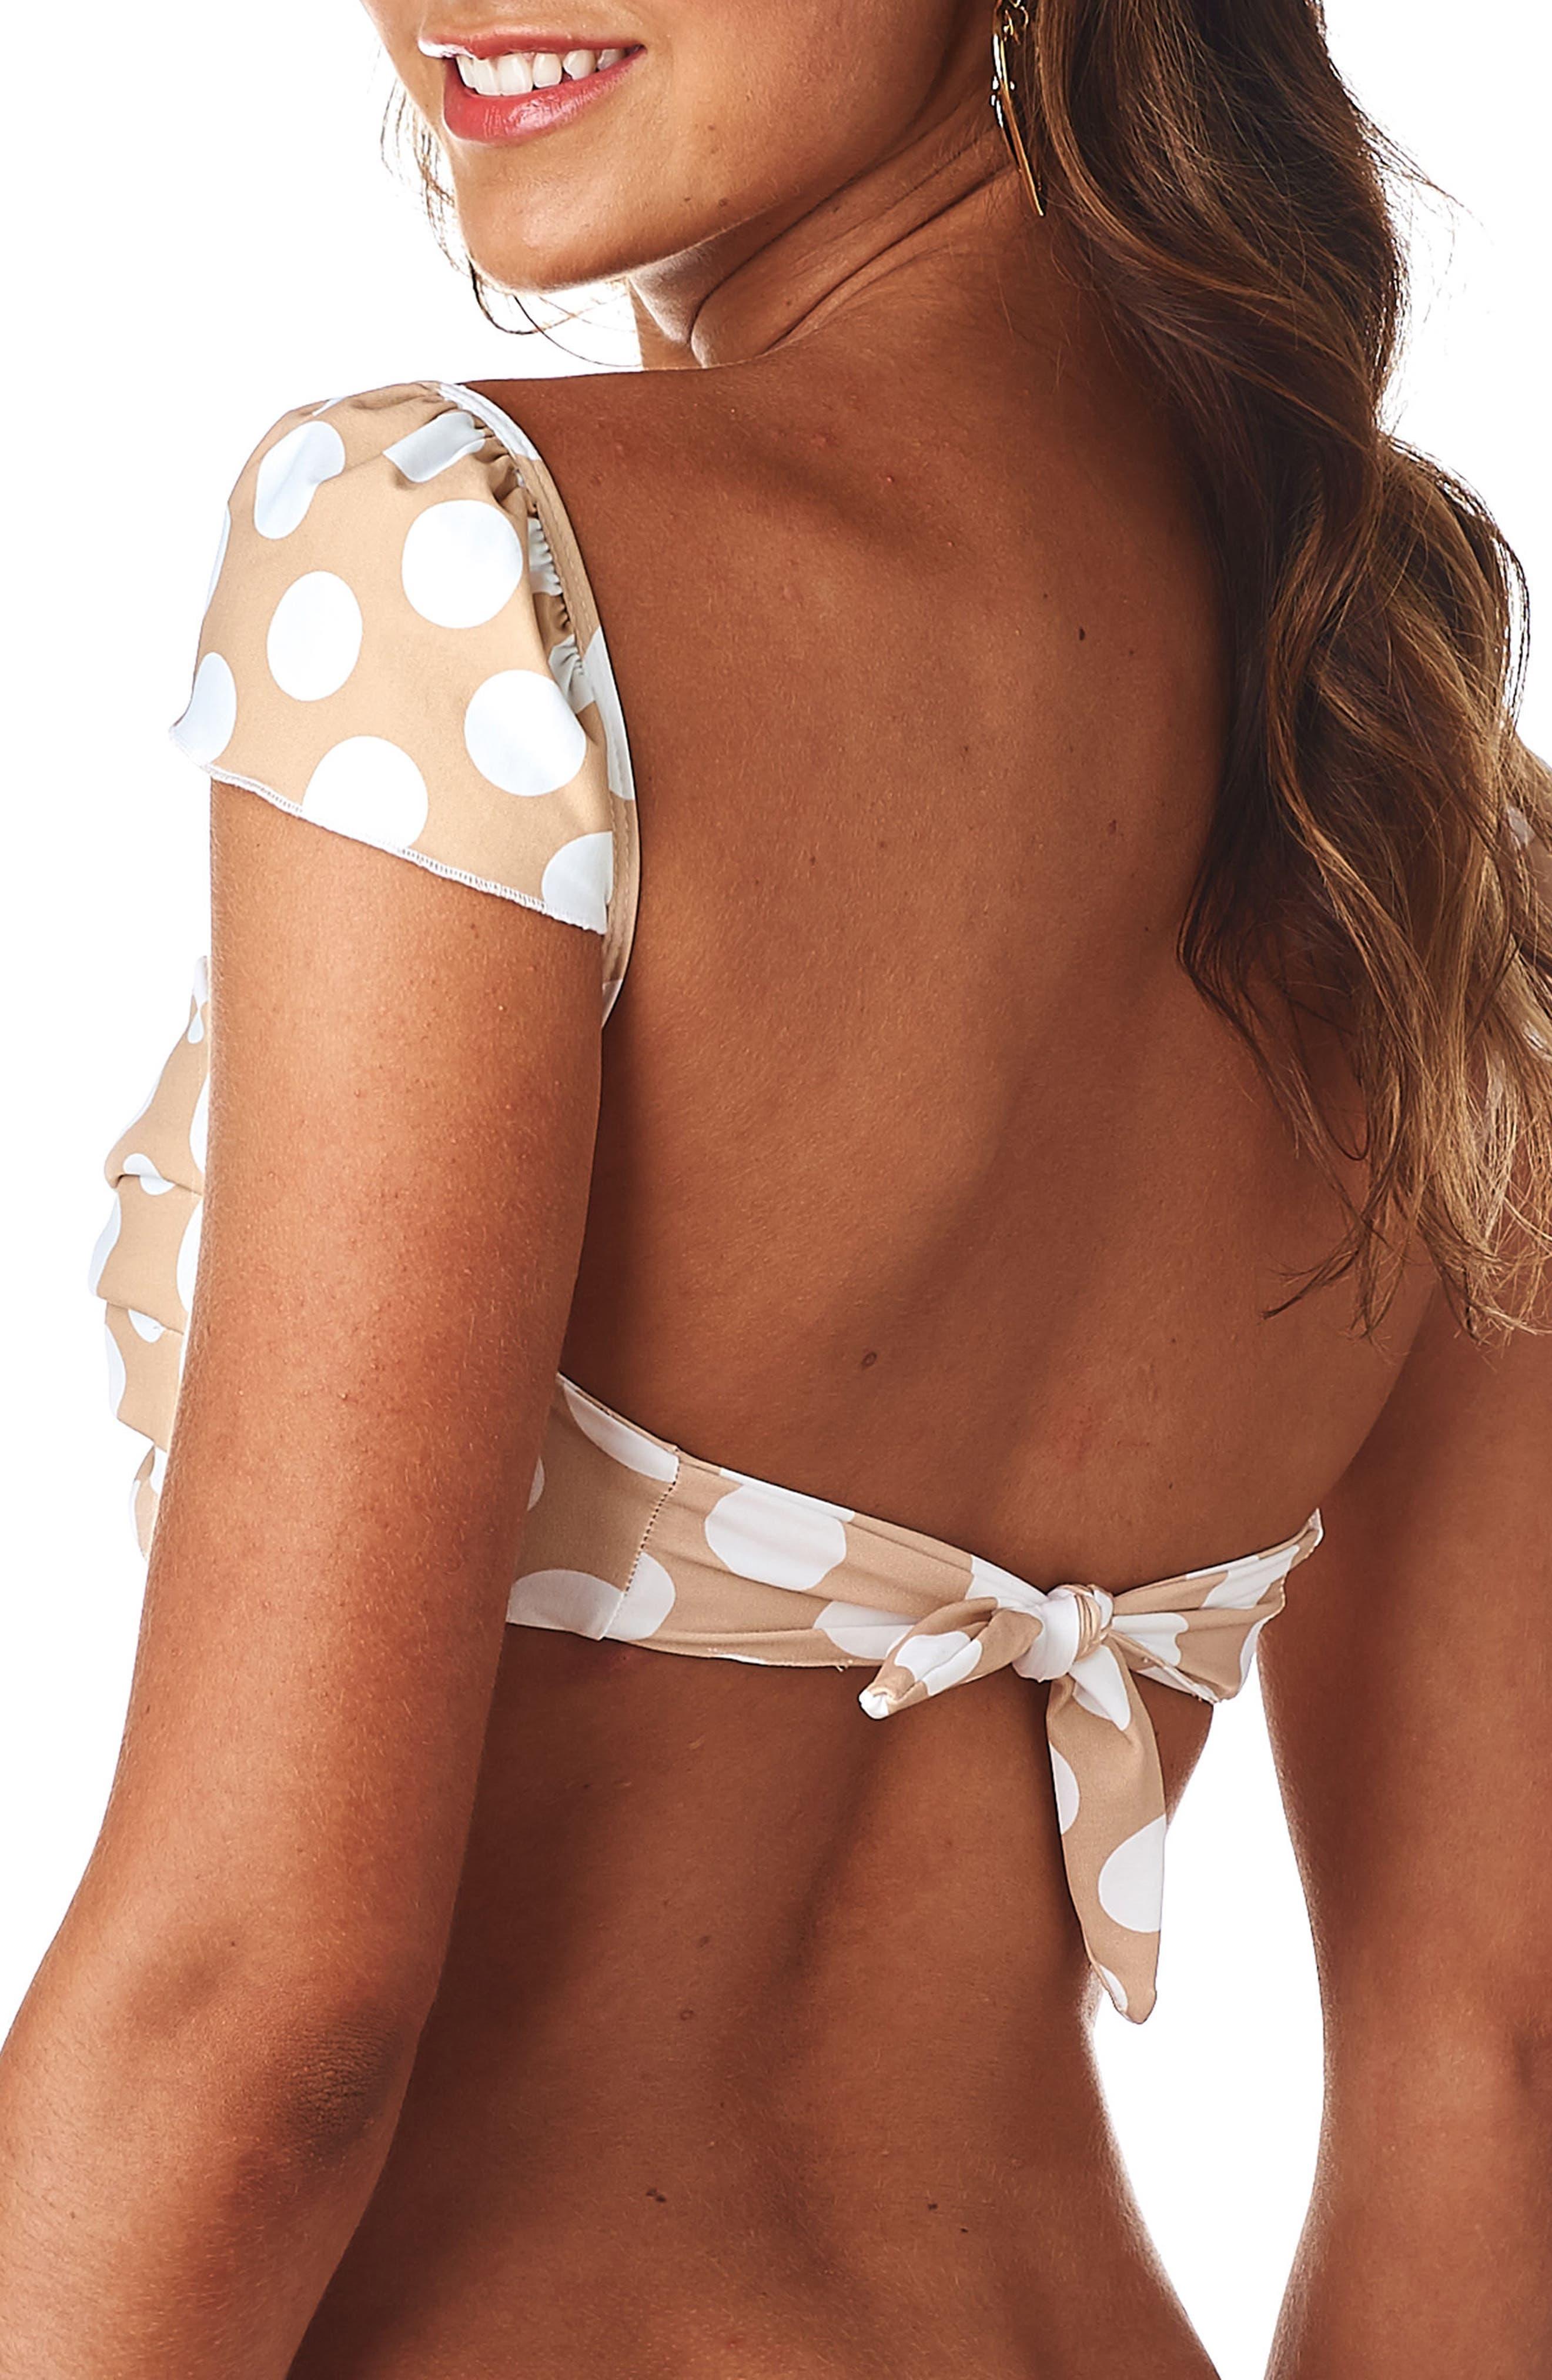 Cabana Polka Dot Bikini Top,                             Alternate thumbnail 2, color,                             250